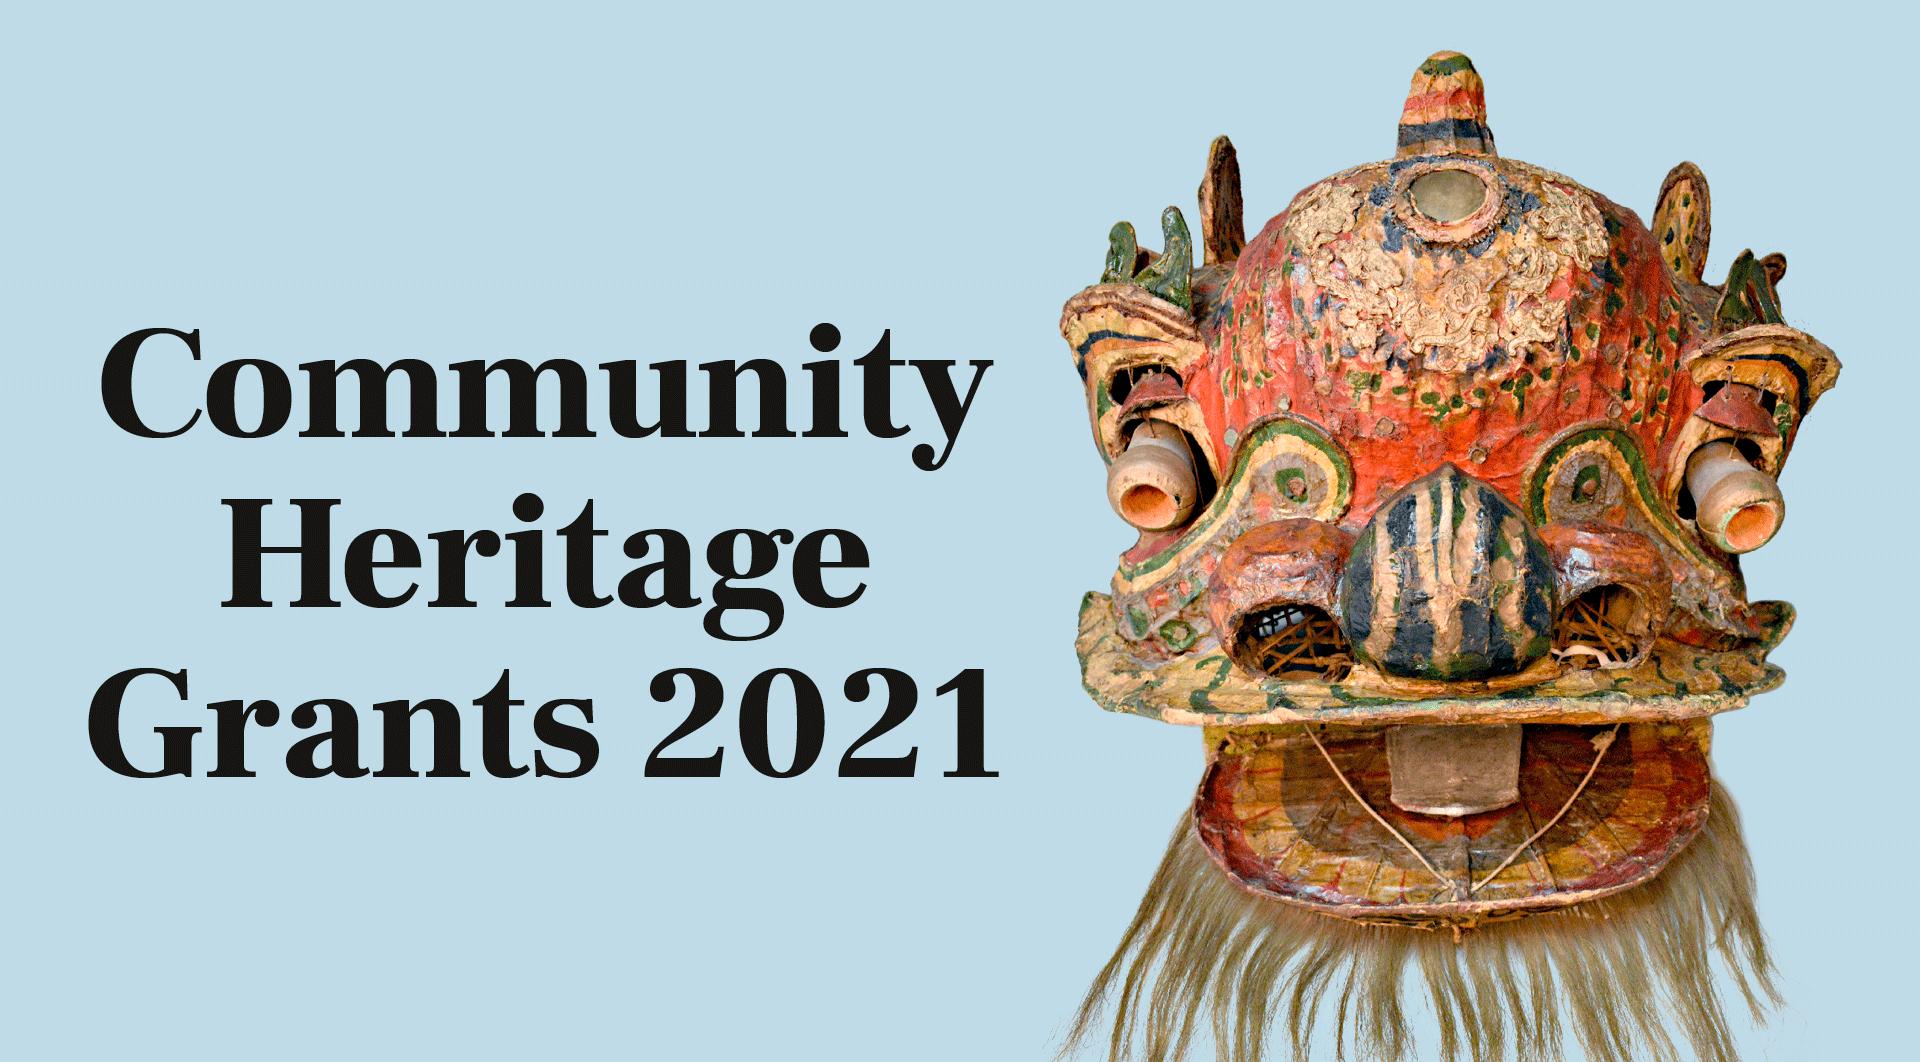 Community Heritage Grants – 2021